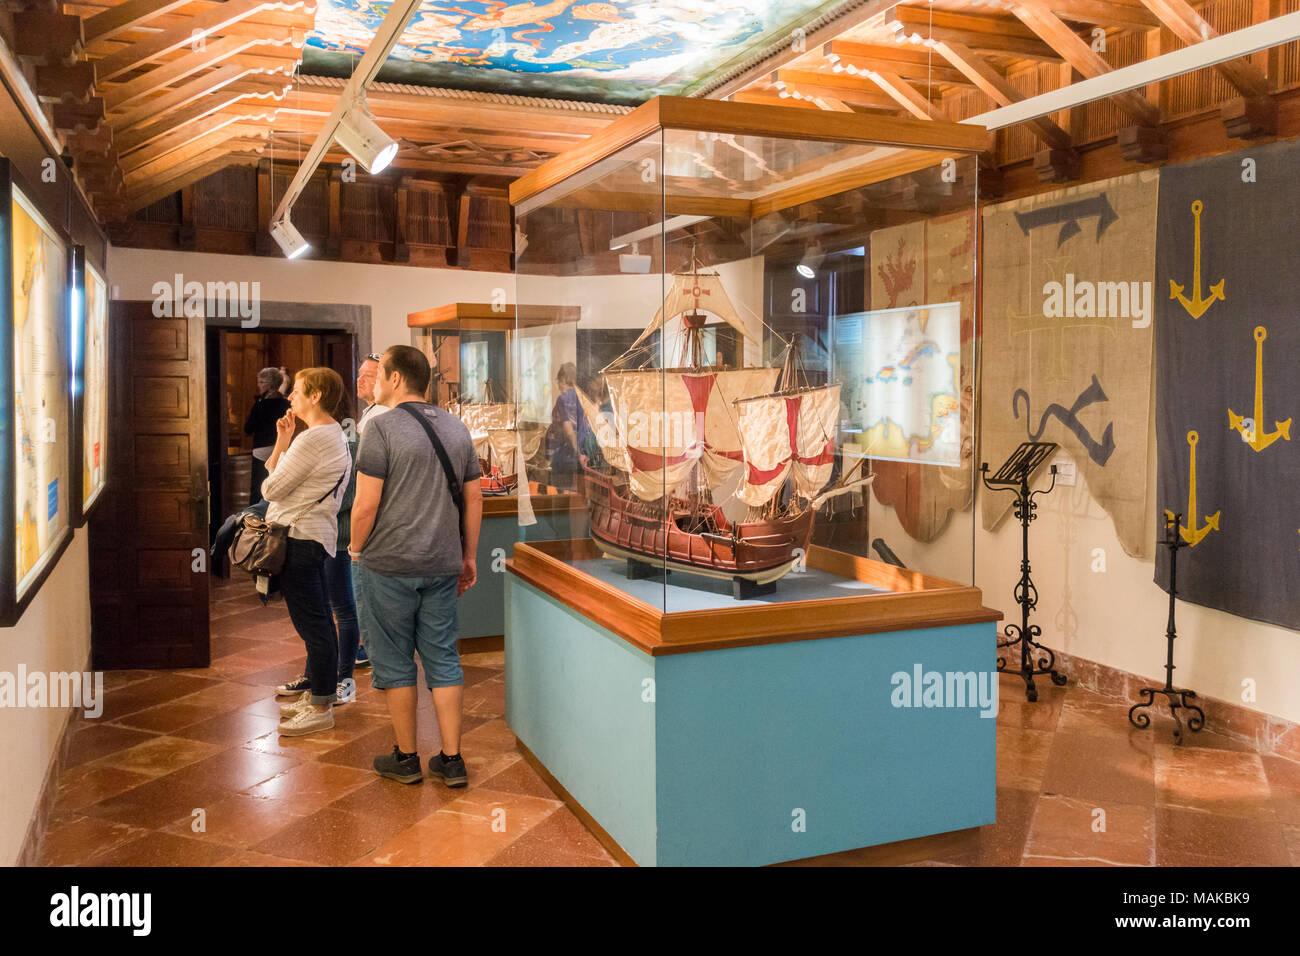 Scale model of Columbus`s Santa Maria caravel ship in Casa de Colón (Columbus` House)  Museum, Las Palmas, in Gran Canaria, Canary Islands, Spain. - Stock Image